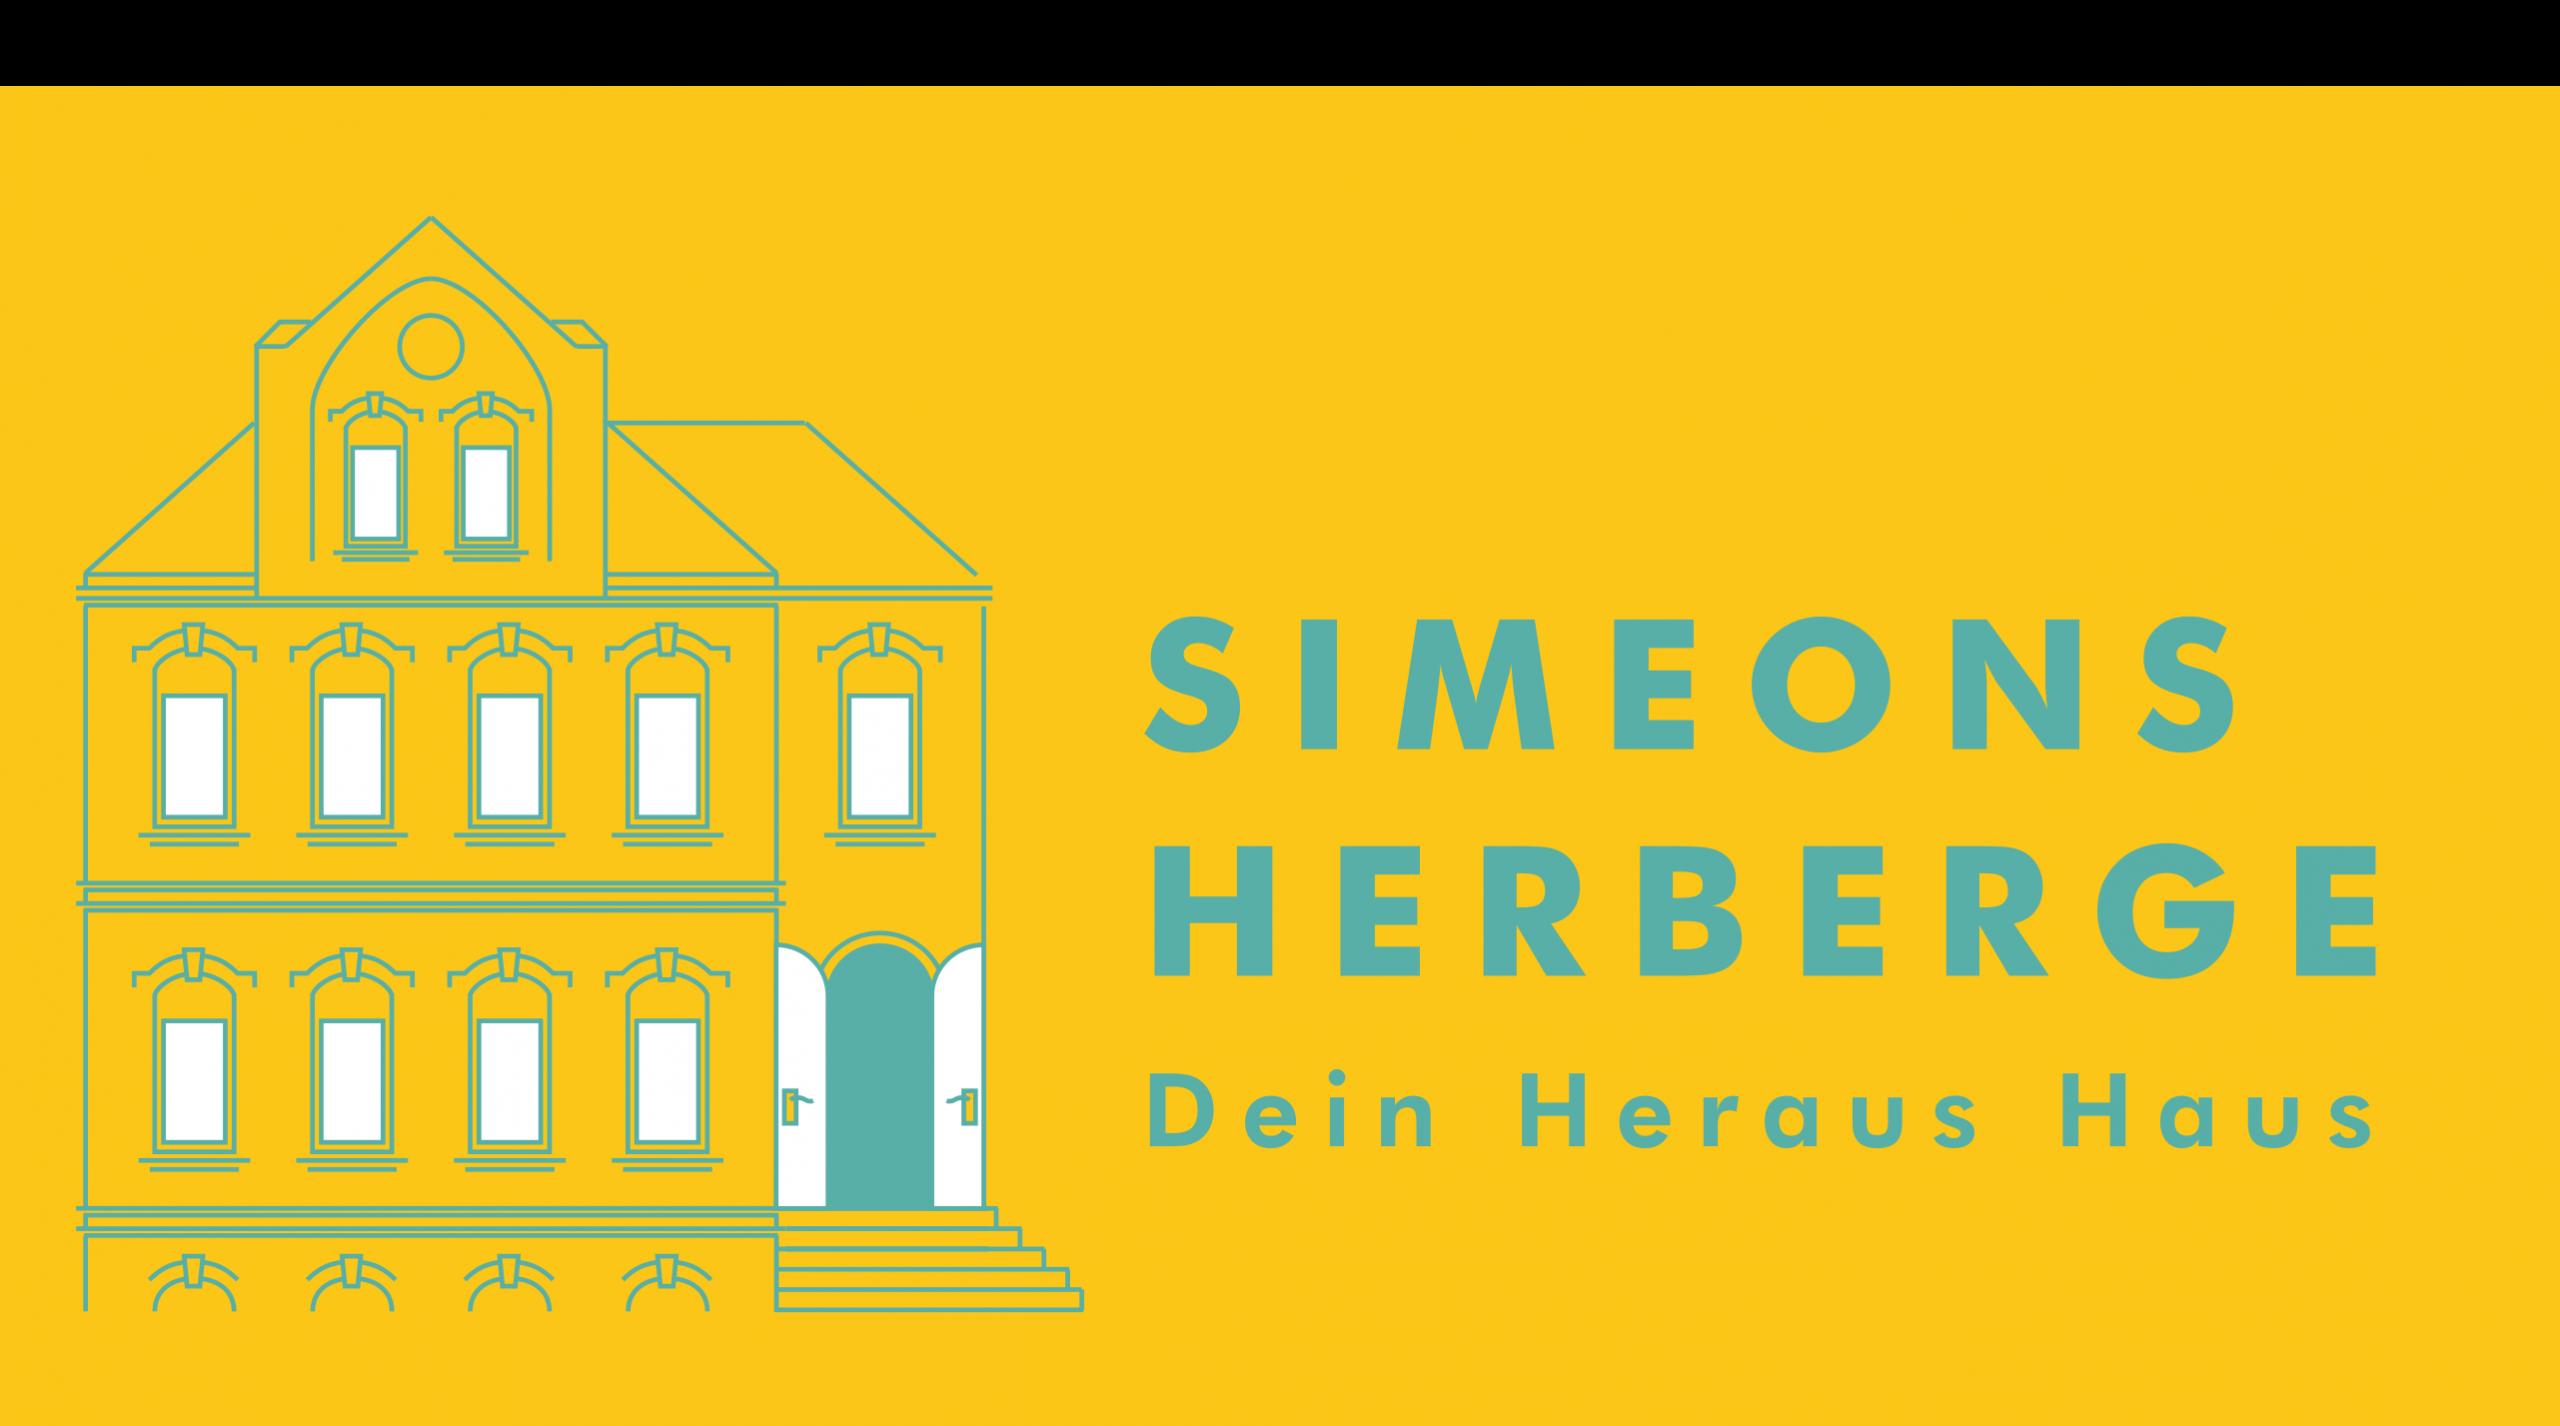 Simeons Herberge